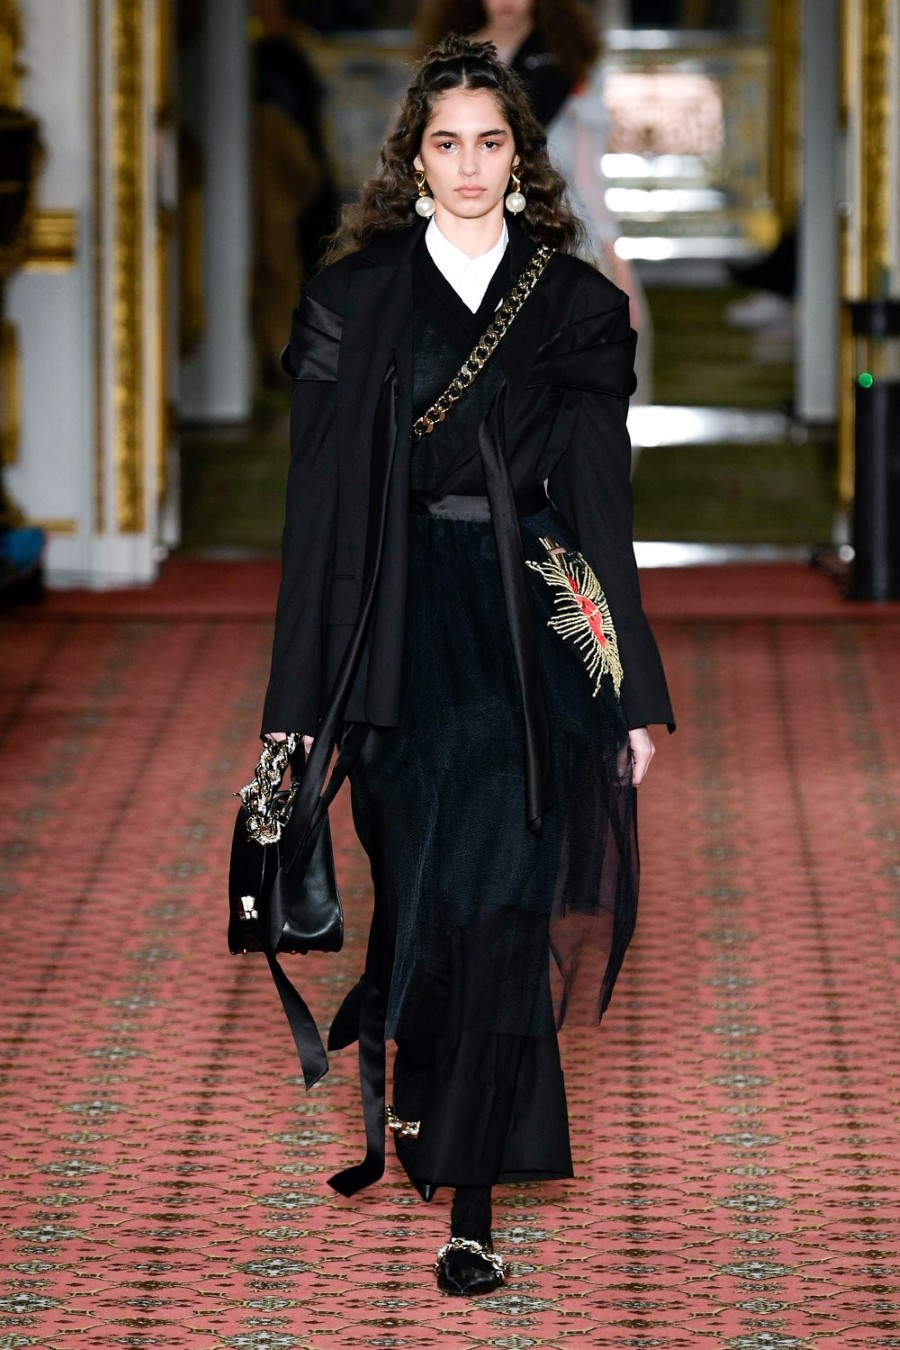 Simone Rocha - Fall Winter 2020 - London Fashion WeekSimone Rocha - Fall Winter 2020 - London Fashion Week